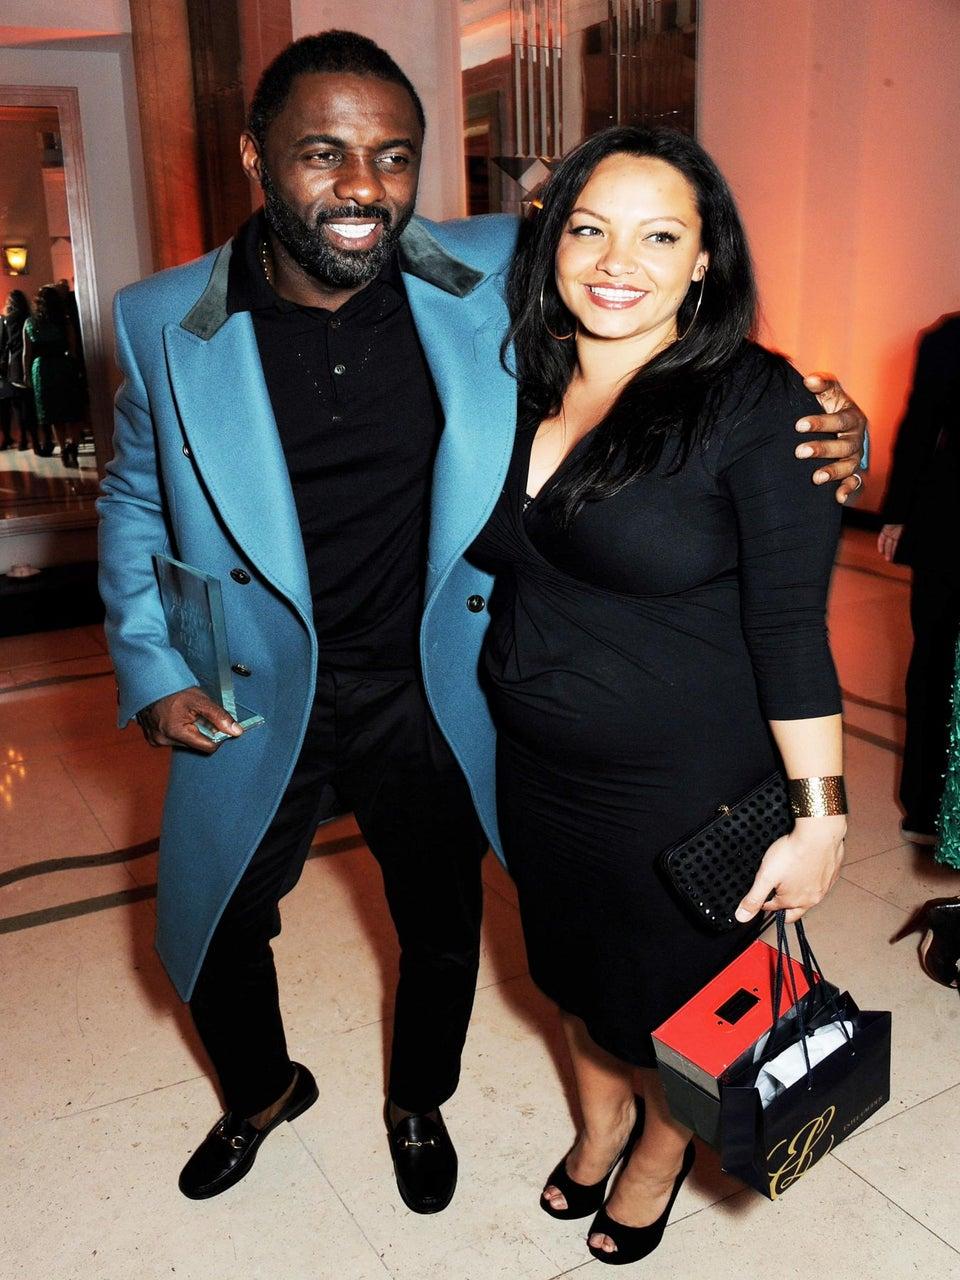 Idris Elba Confirms He's Having a Baby, Reveals Father's Death